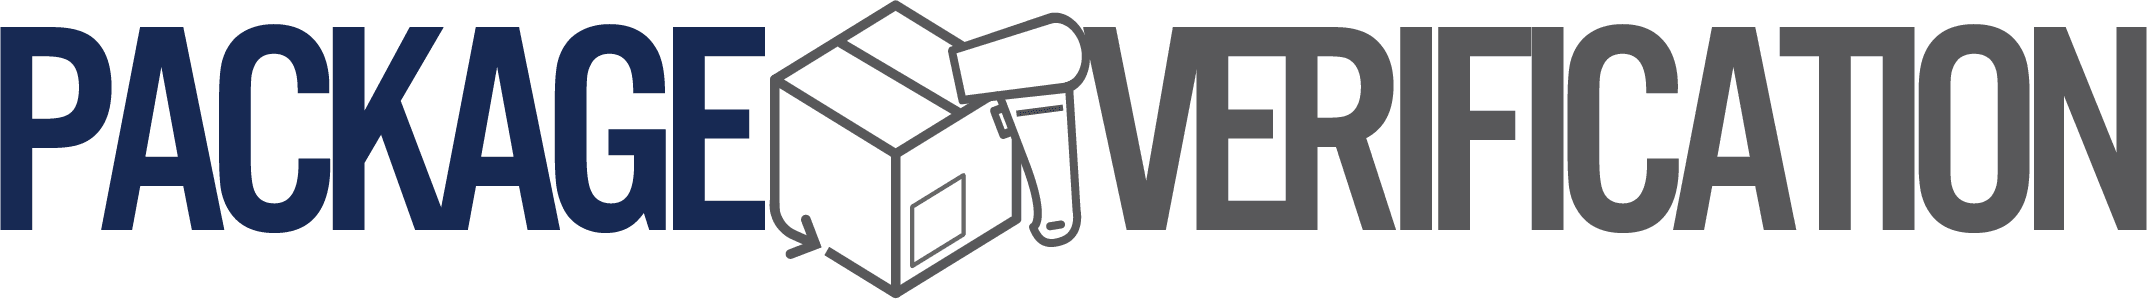 Vérification des colis Logo horizontal